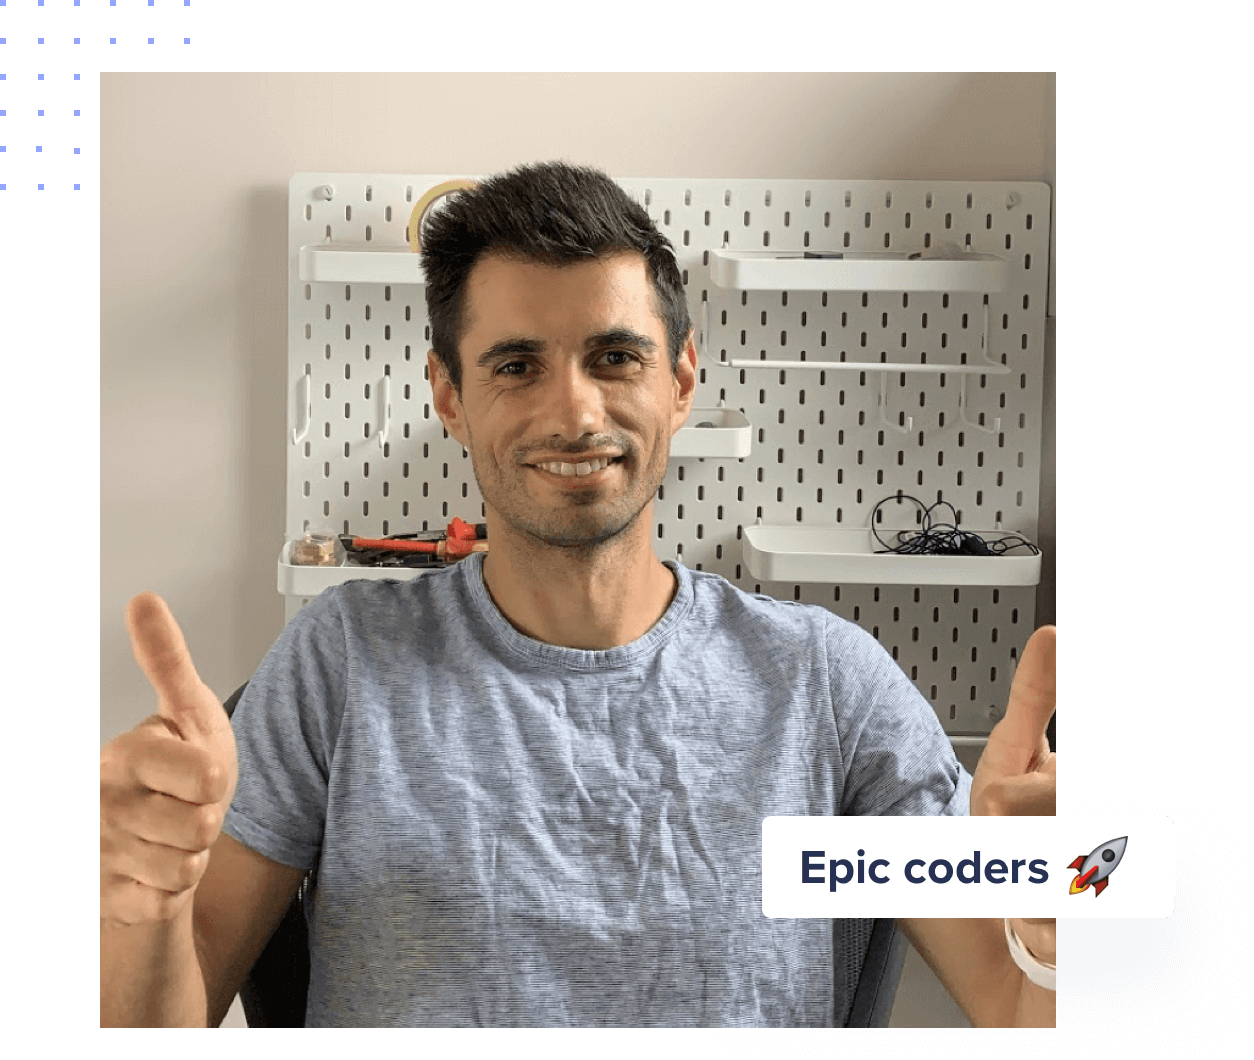 Spiridon from Epic Coders